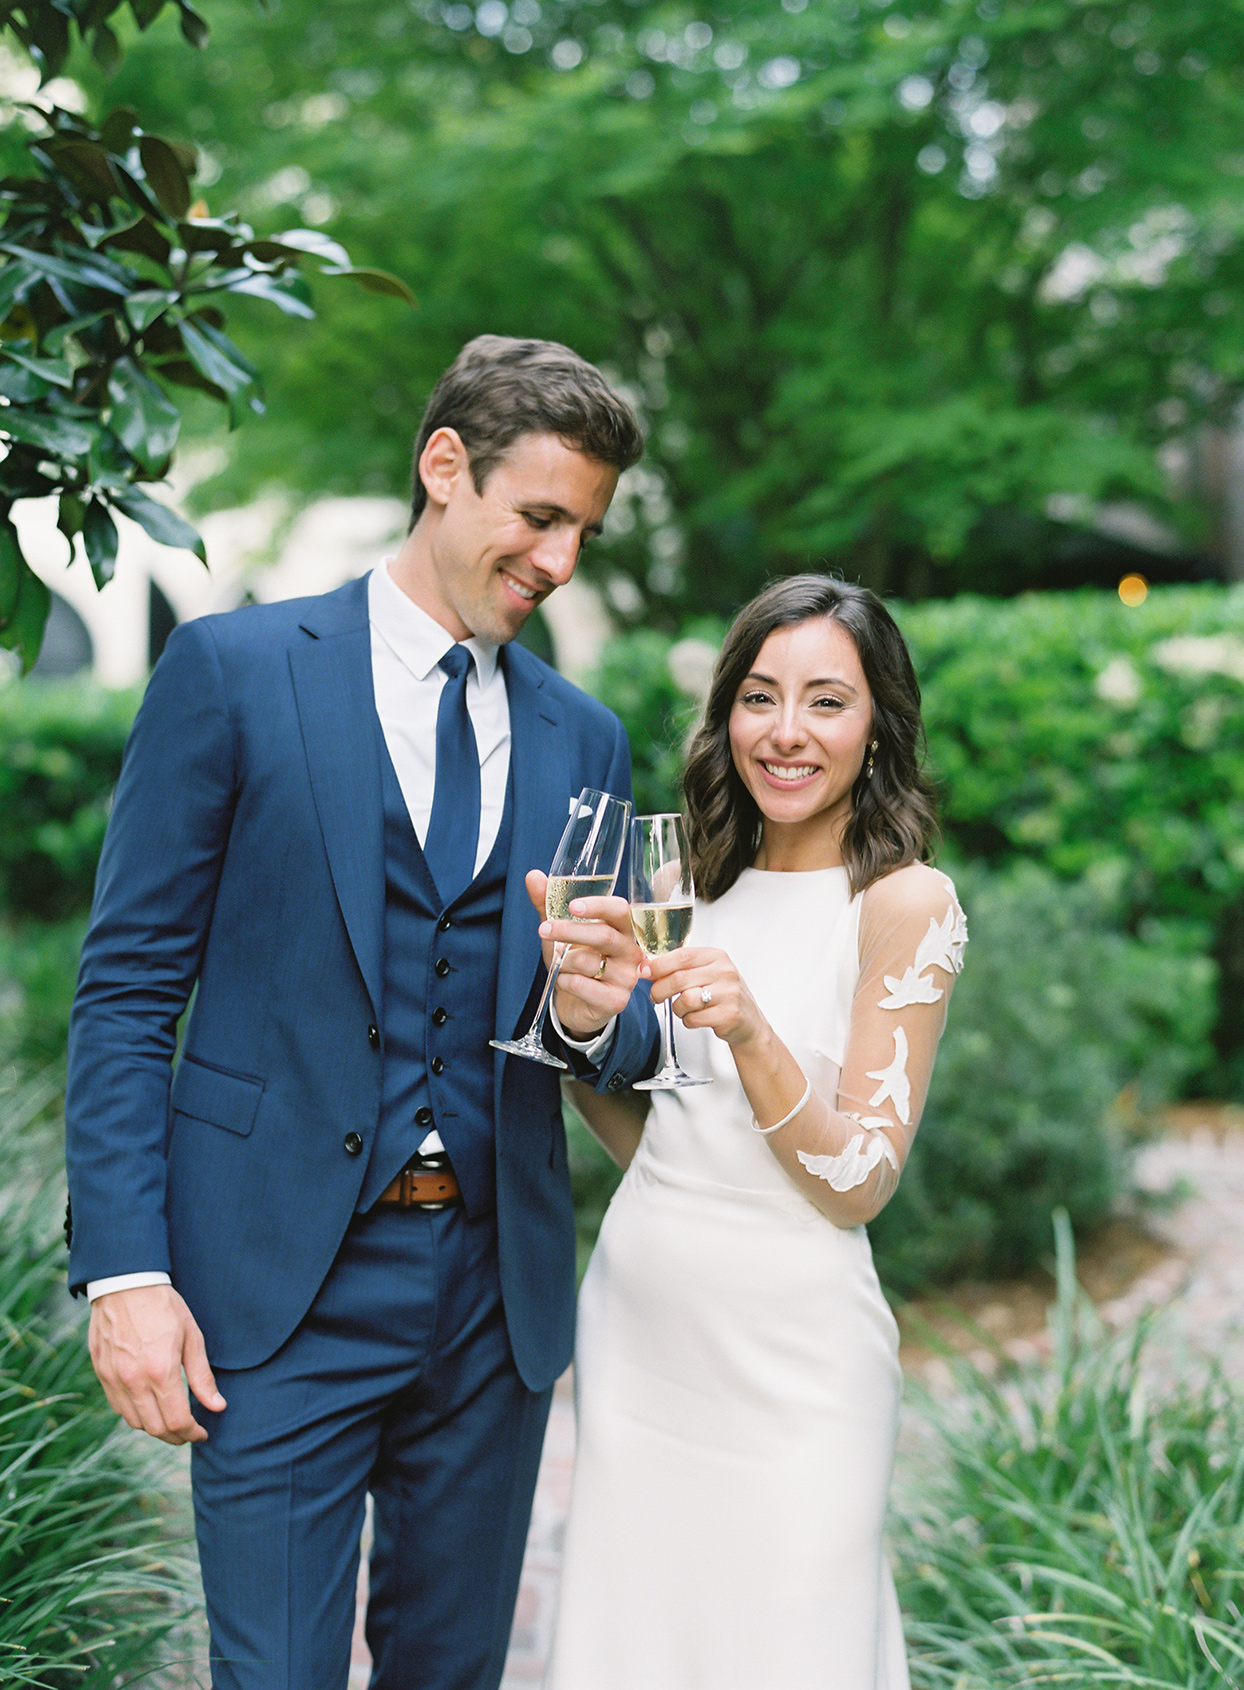 paula terence wedding couple toasting champagne